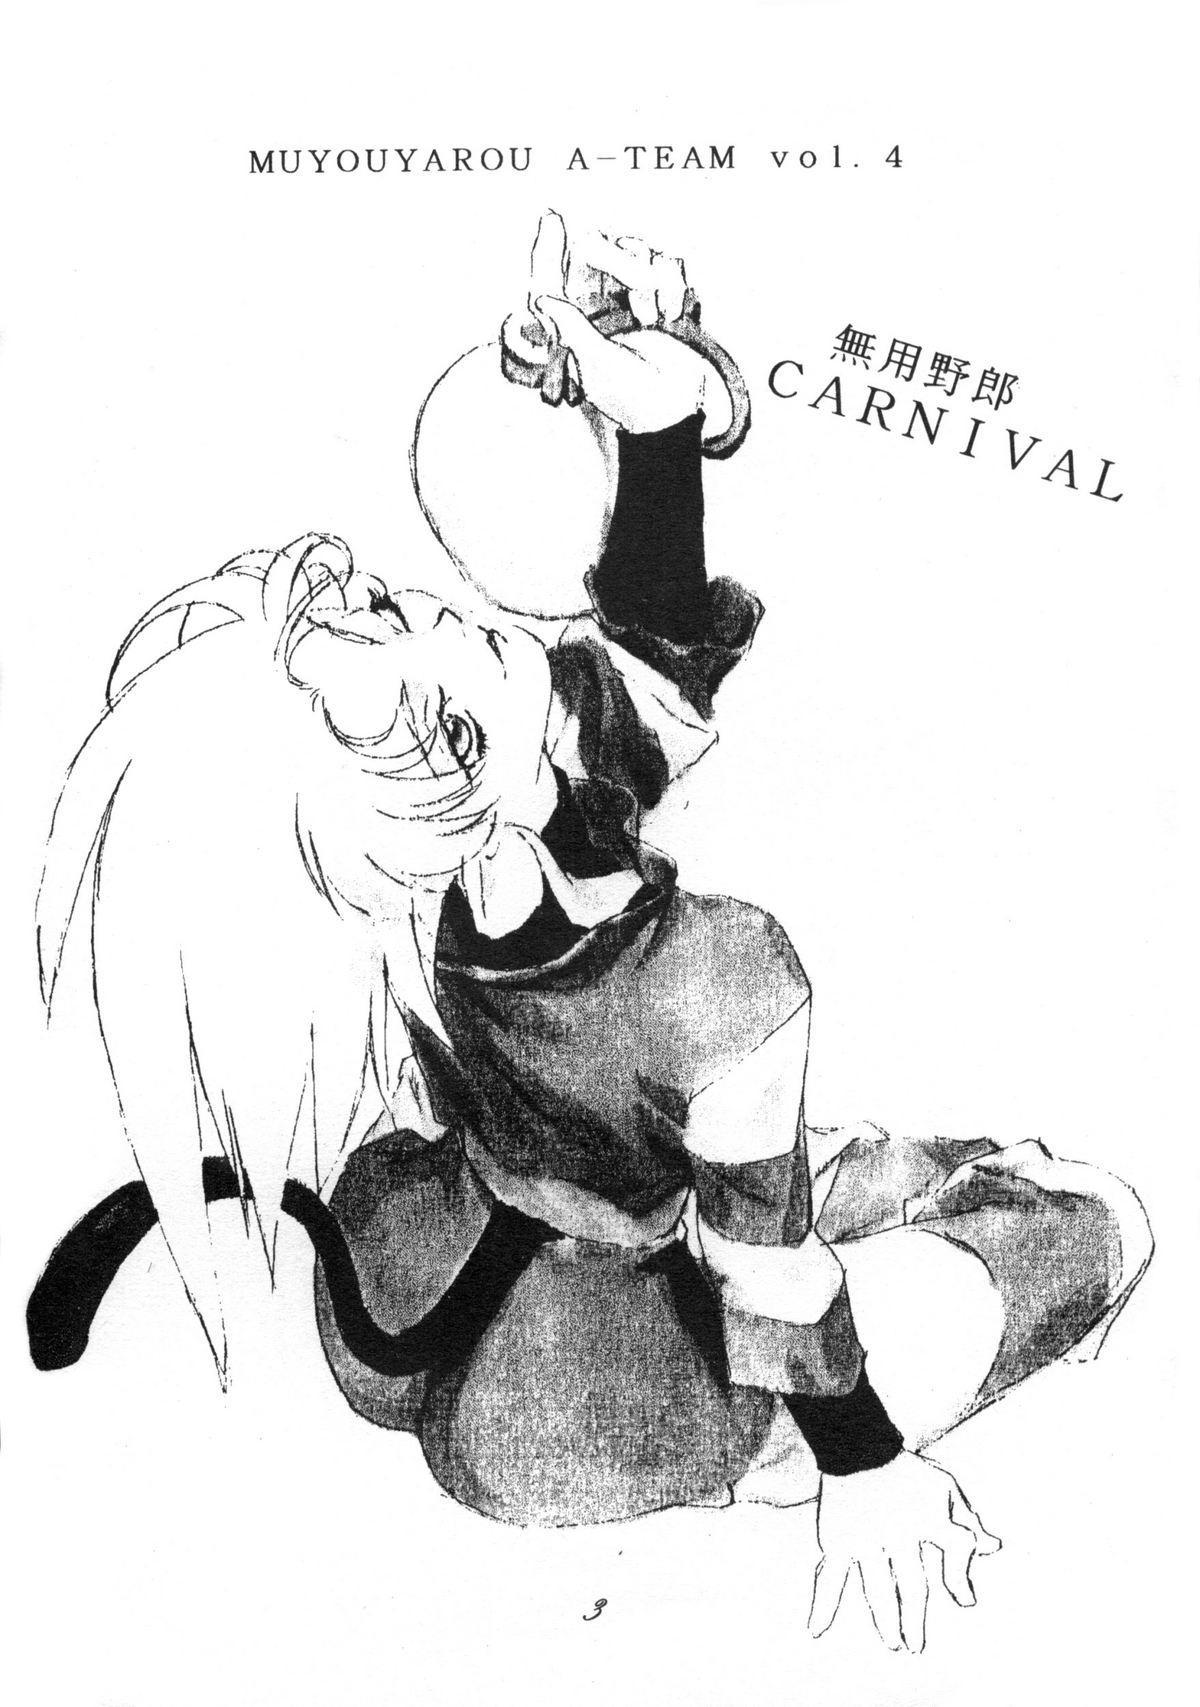 Muyou Yarou A-Team 4 Carnival 1